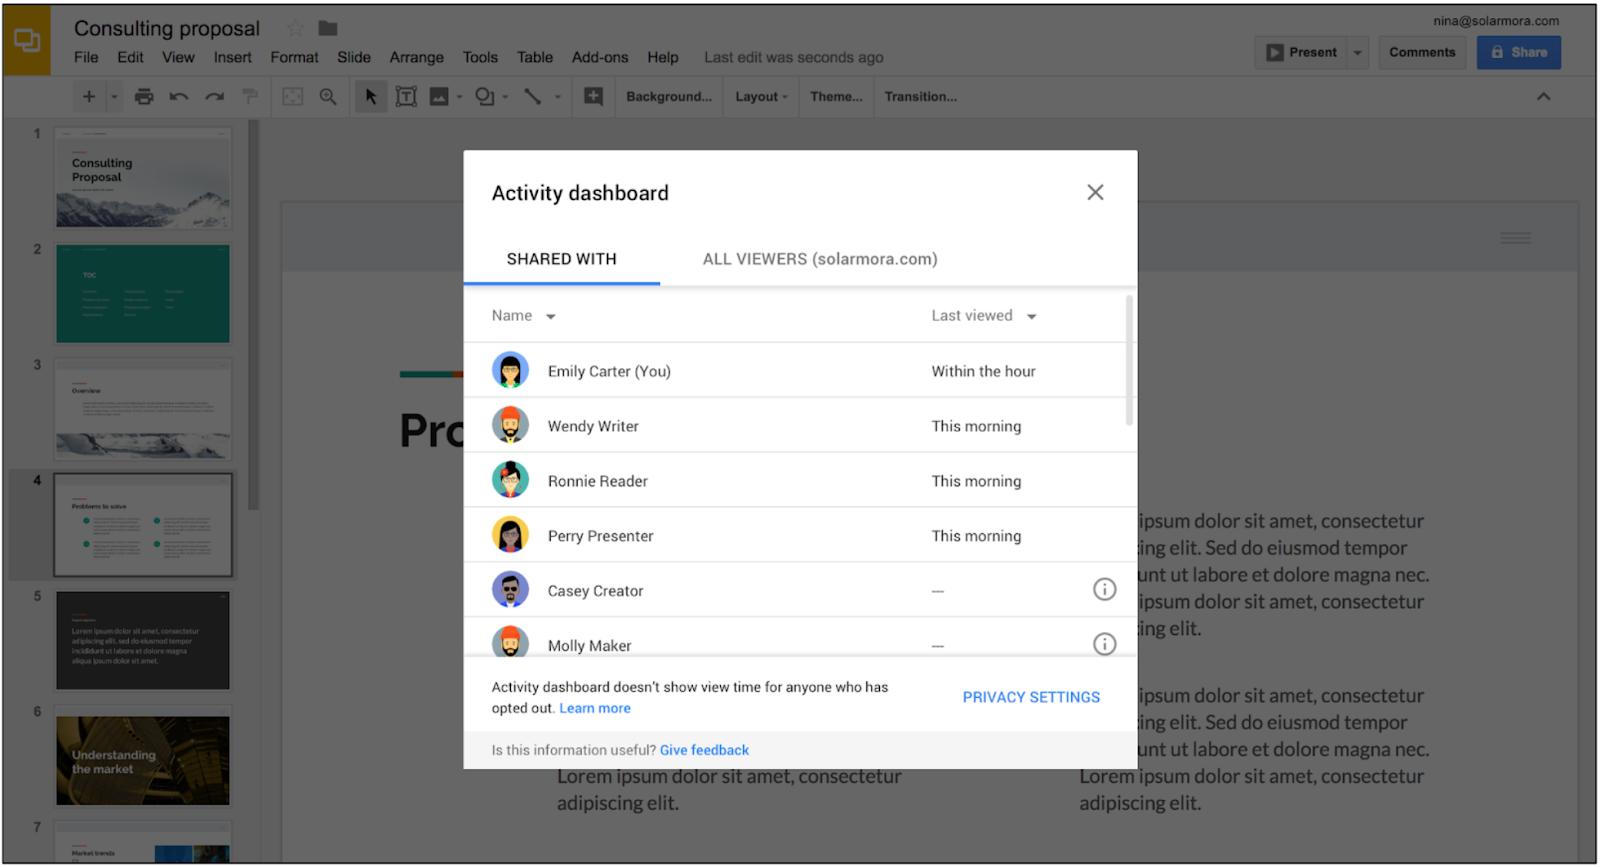 G Suite Updates Blog: Improve collaboration in Google Docs